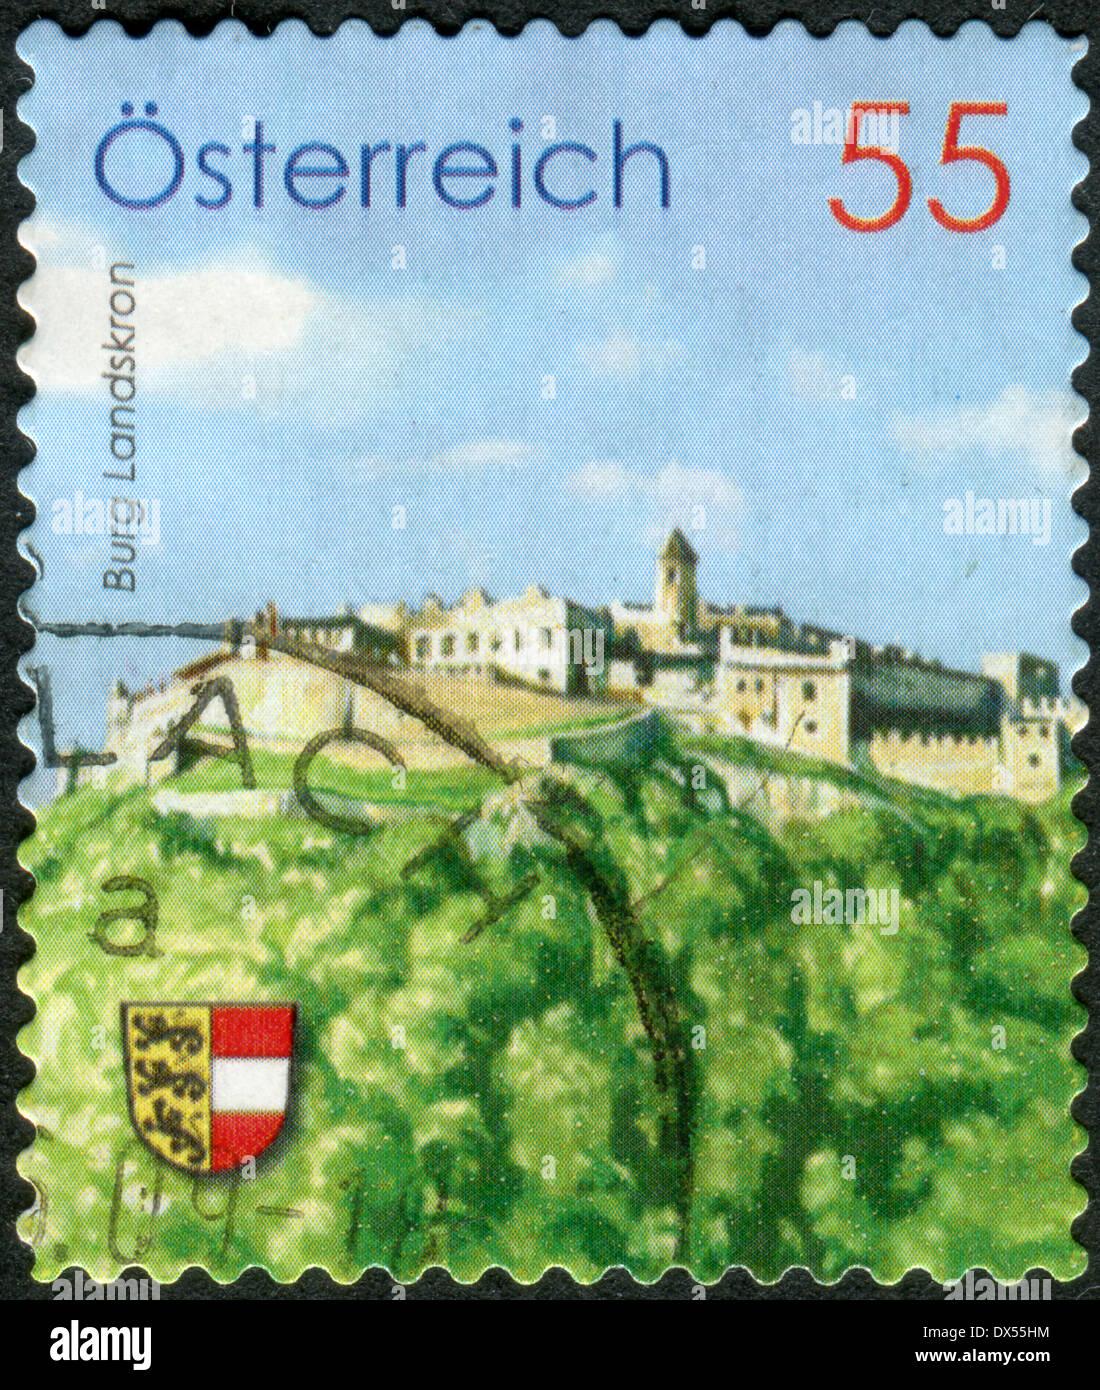 AUSTRIA - CIRCA 2009: Postage stamp printed in Austria, shows Burg Landskron, circa 2009 Stock Photo